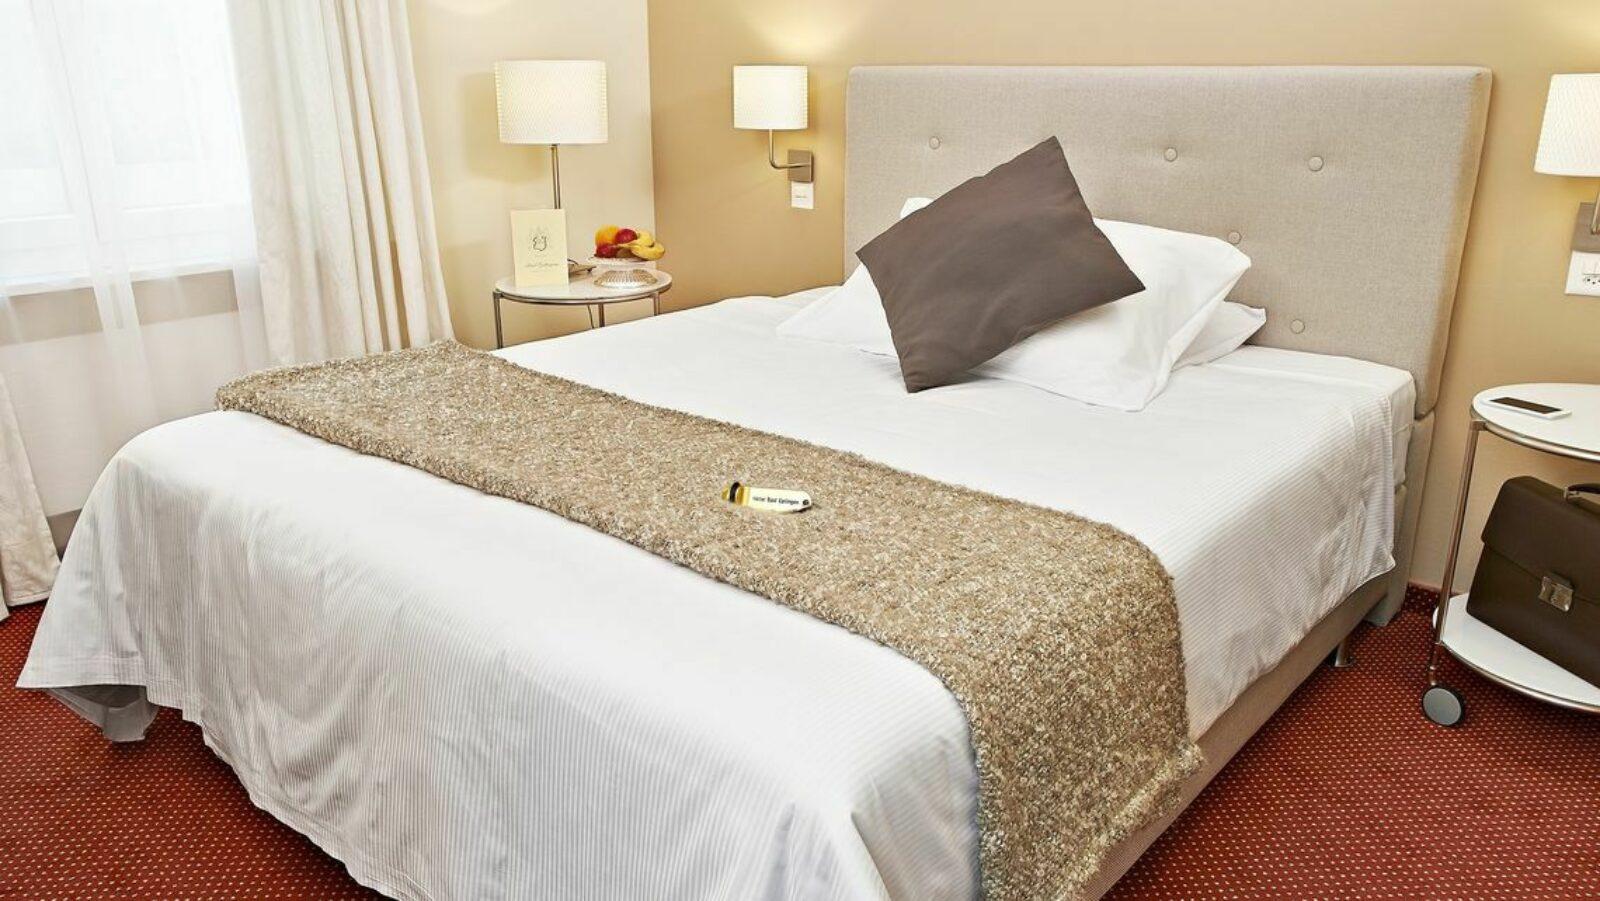 Zimmer Hotel Bad Eptingen 3